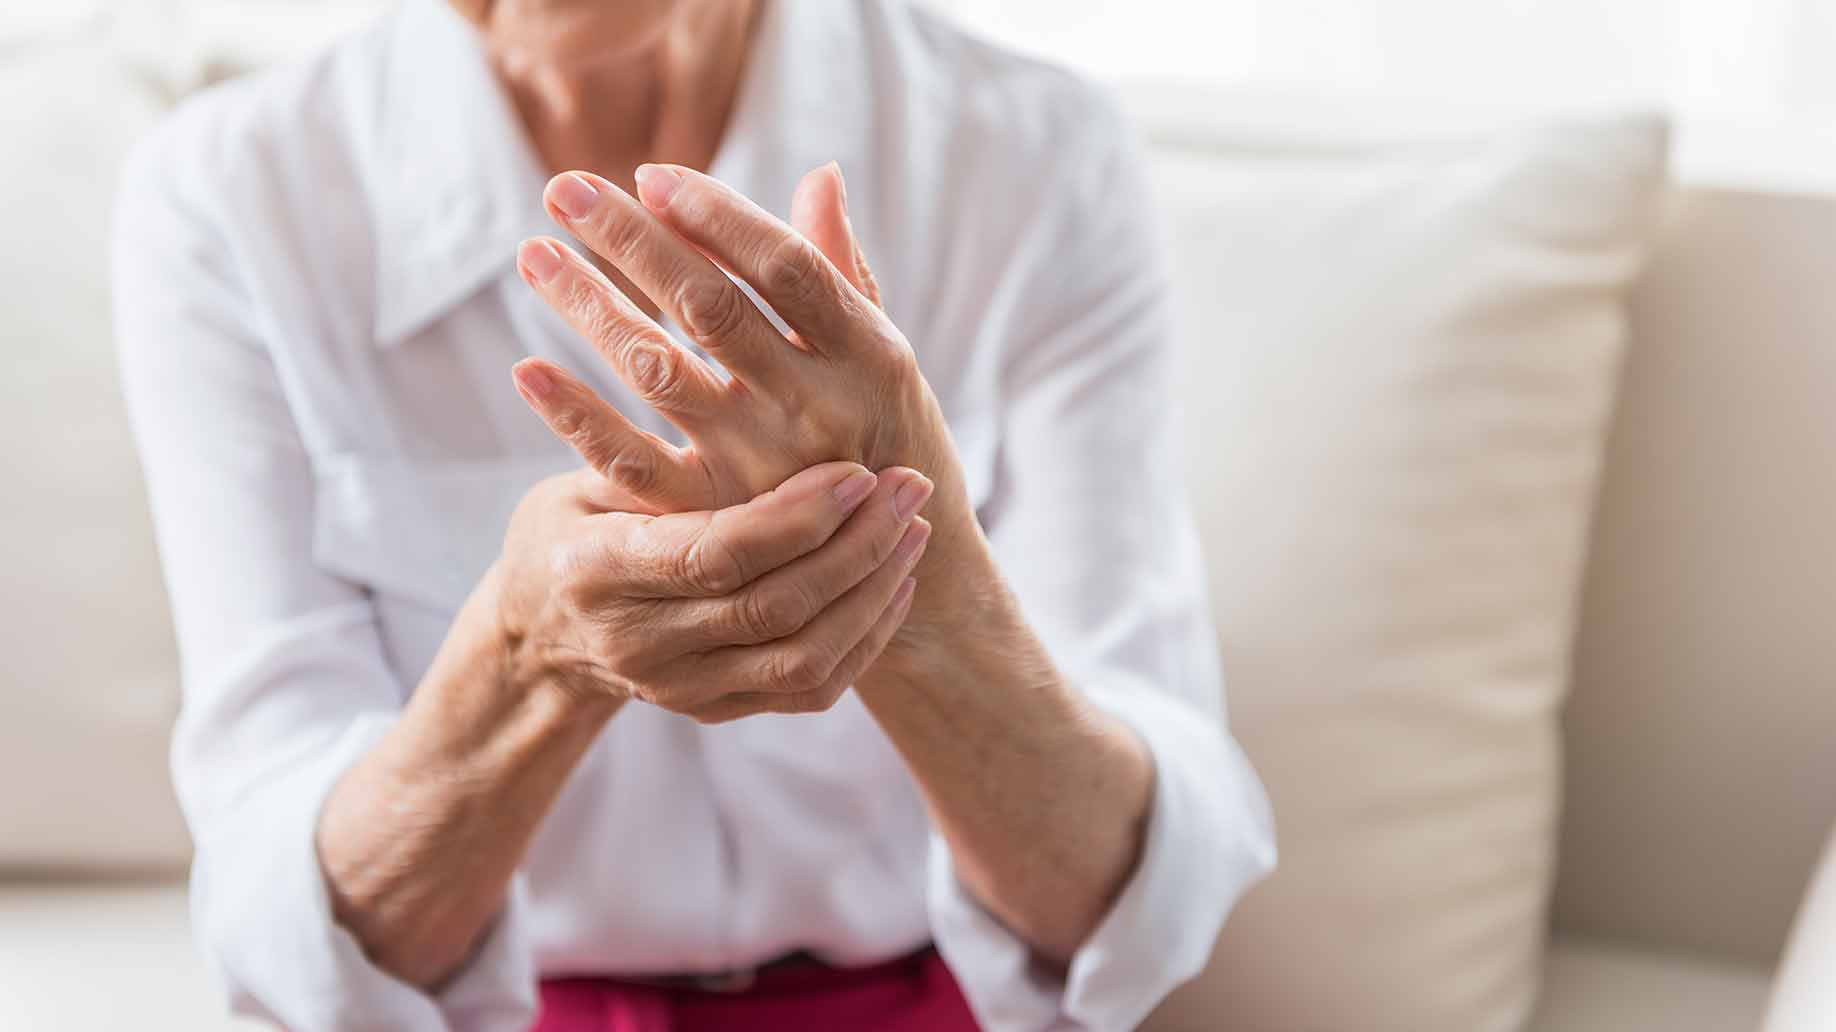 arthritis inflammation pain joints bones swelling aches natural remedies turmeric curcumin health benefits